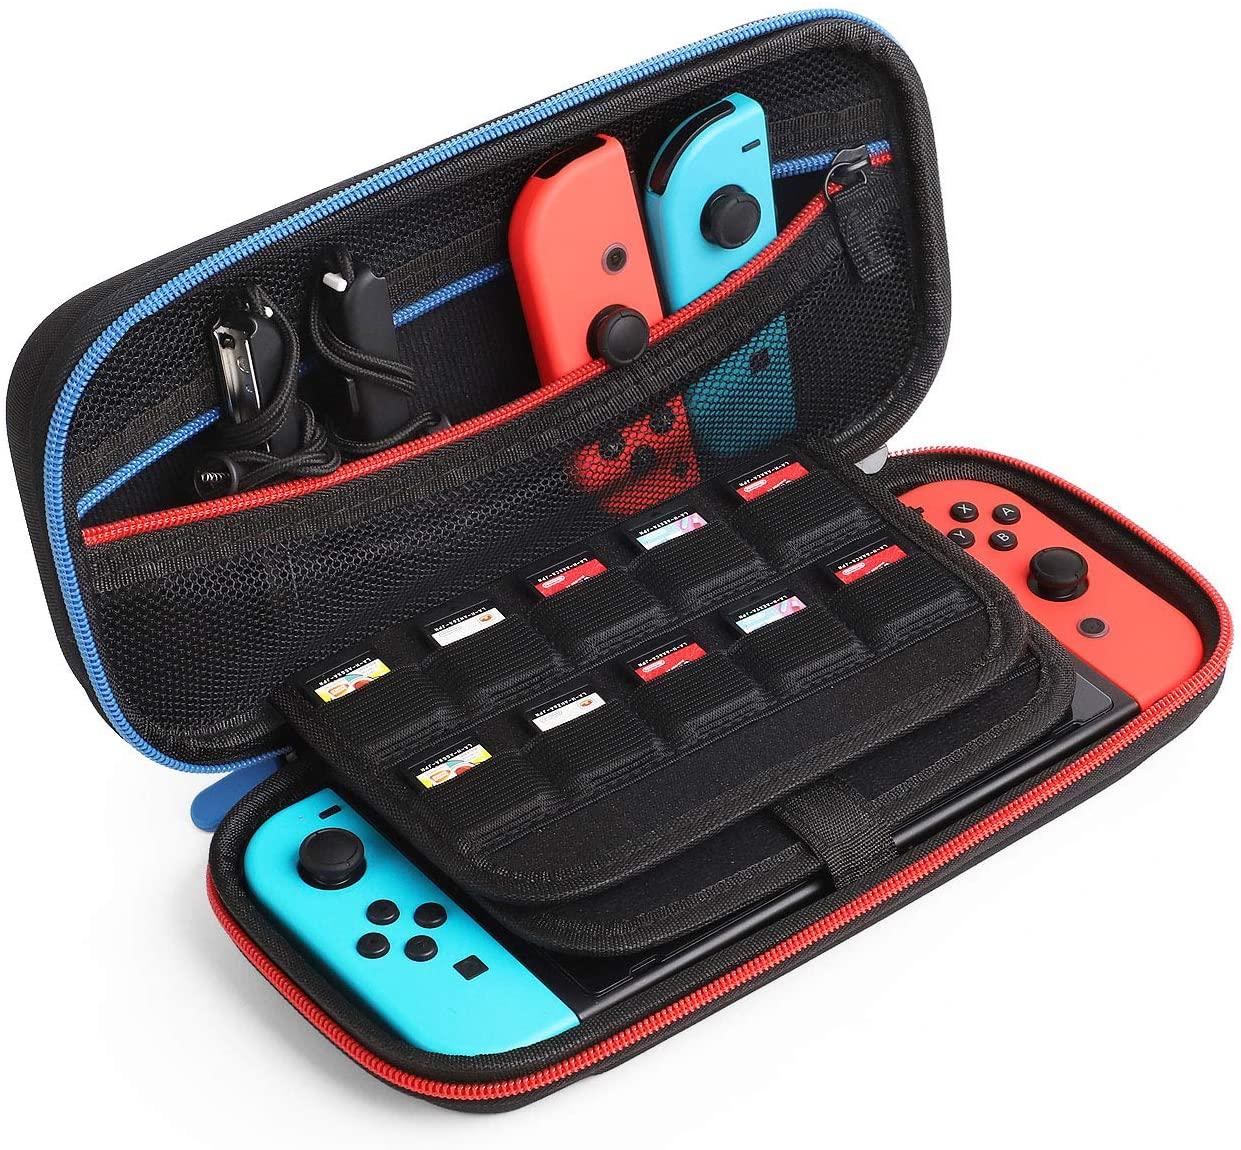 Kootek Travel Carrying Case for Nintendo Switch, 20 Games Cartridges & Zipper Mesh Pocket Protective Hard Shell Carry Cases for Nintendo Switch Console & Accessories, Black